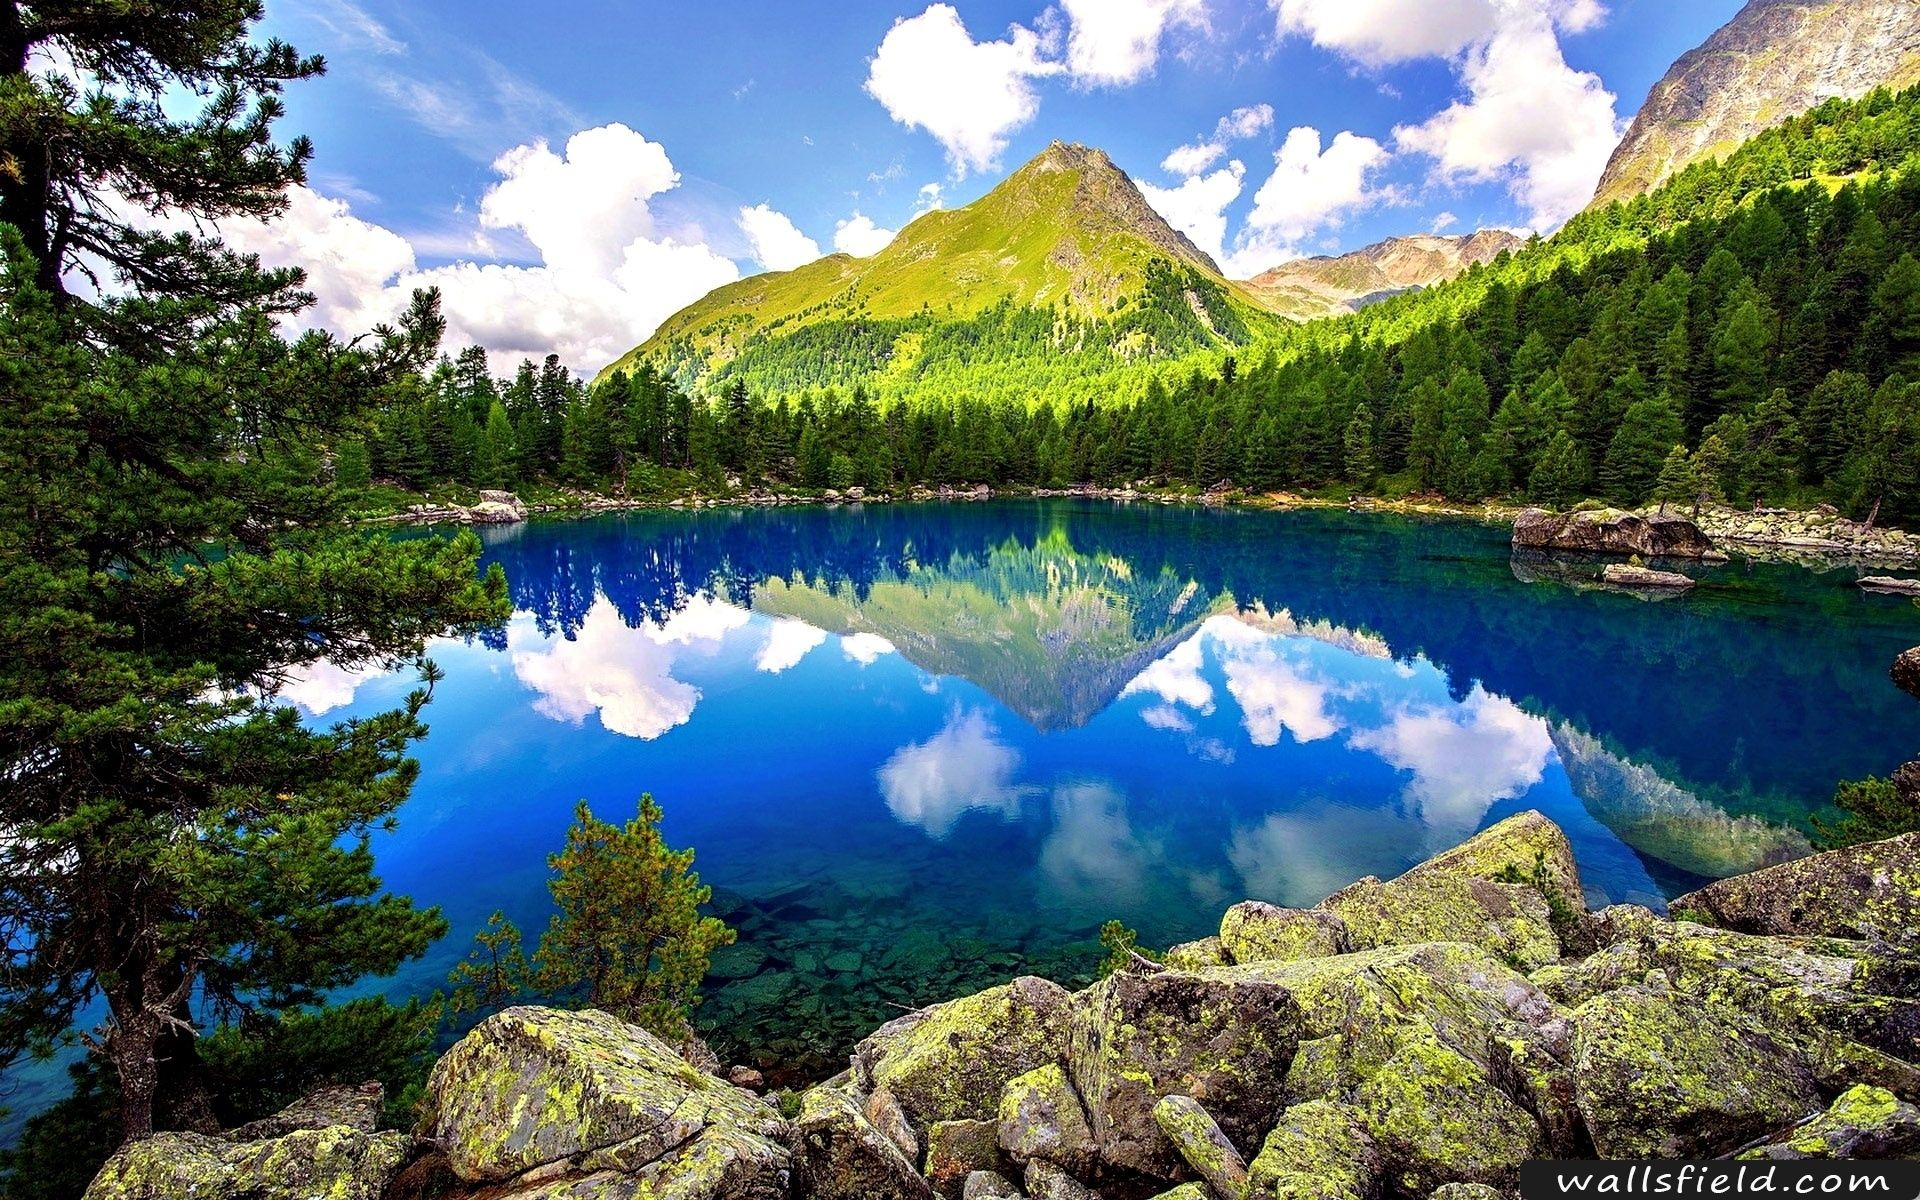 Spring Mountain Landscape Wallsfield Com Free Hd Wallpapers Landscape Wallpaper Mountain Landscape Lake Landscape